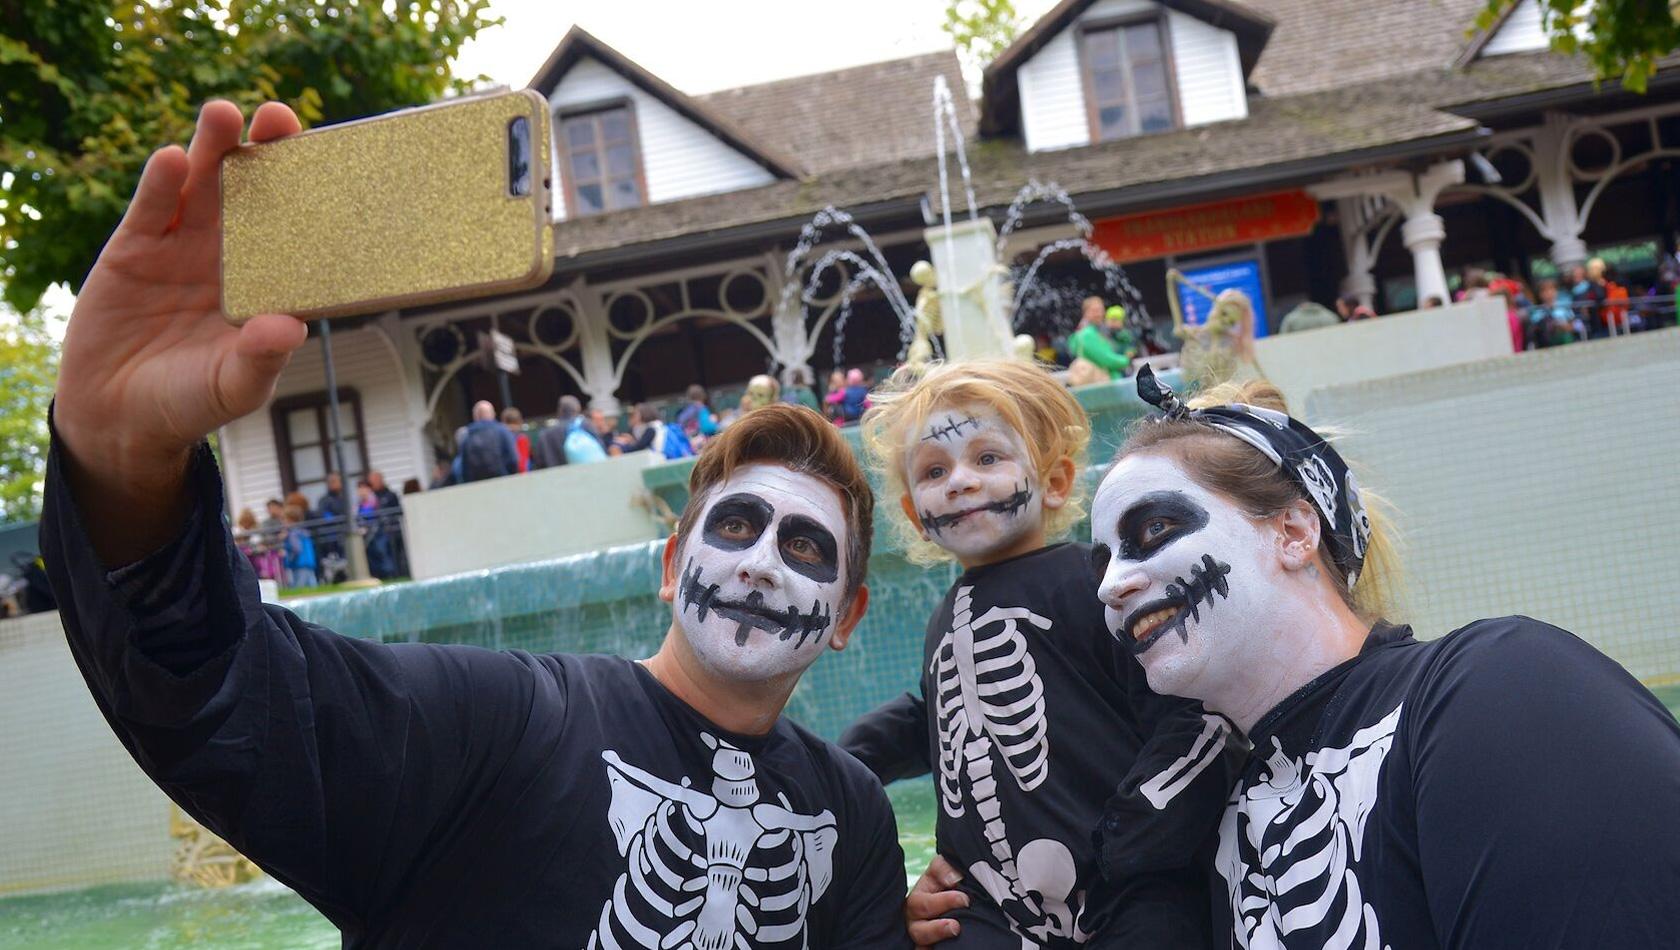 Halloween A Gardaland.Gardaland Magic Halloween Im Oktober Und November 2018